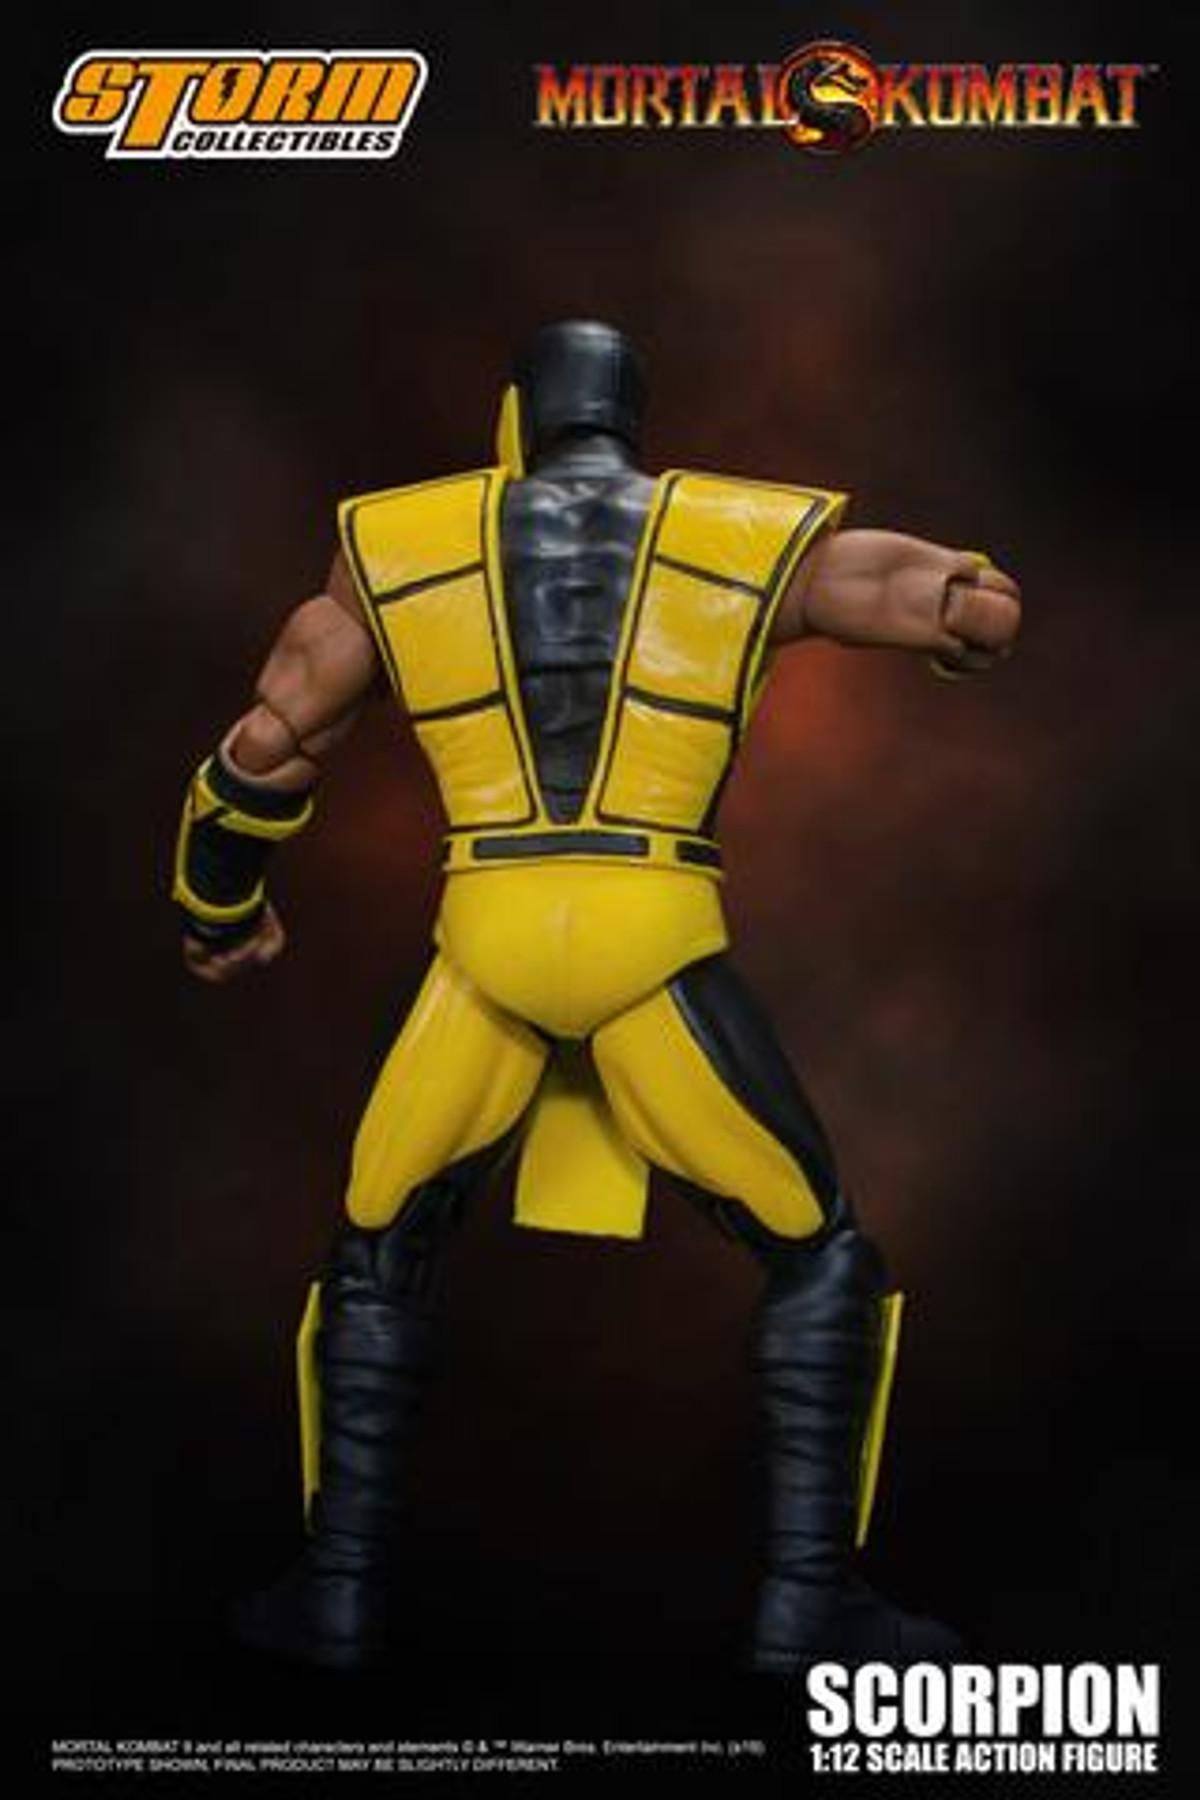 Mortal Kombat 3 Scorpion Storm 1//12 Scale Action Figure